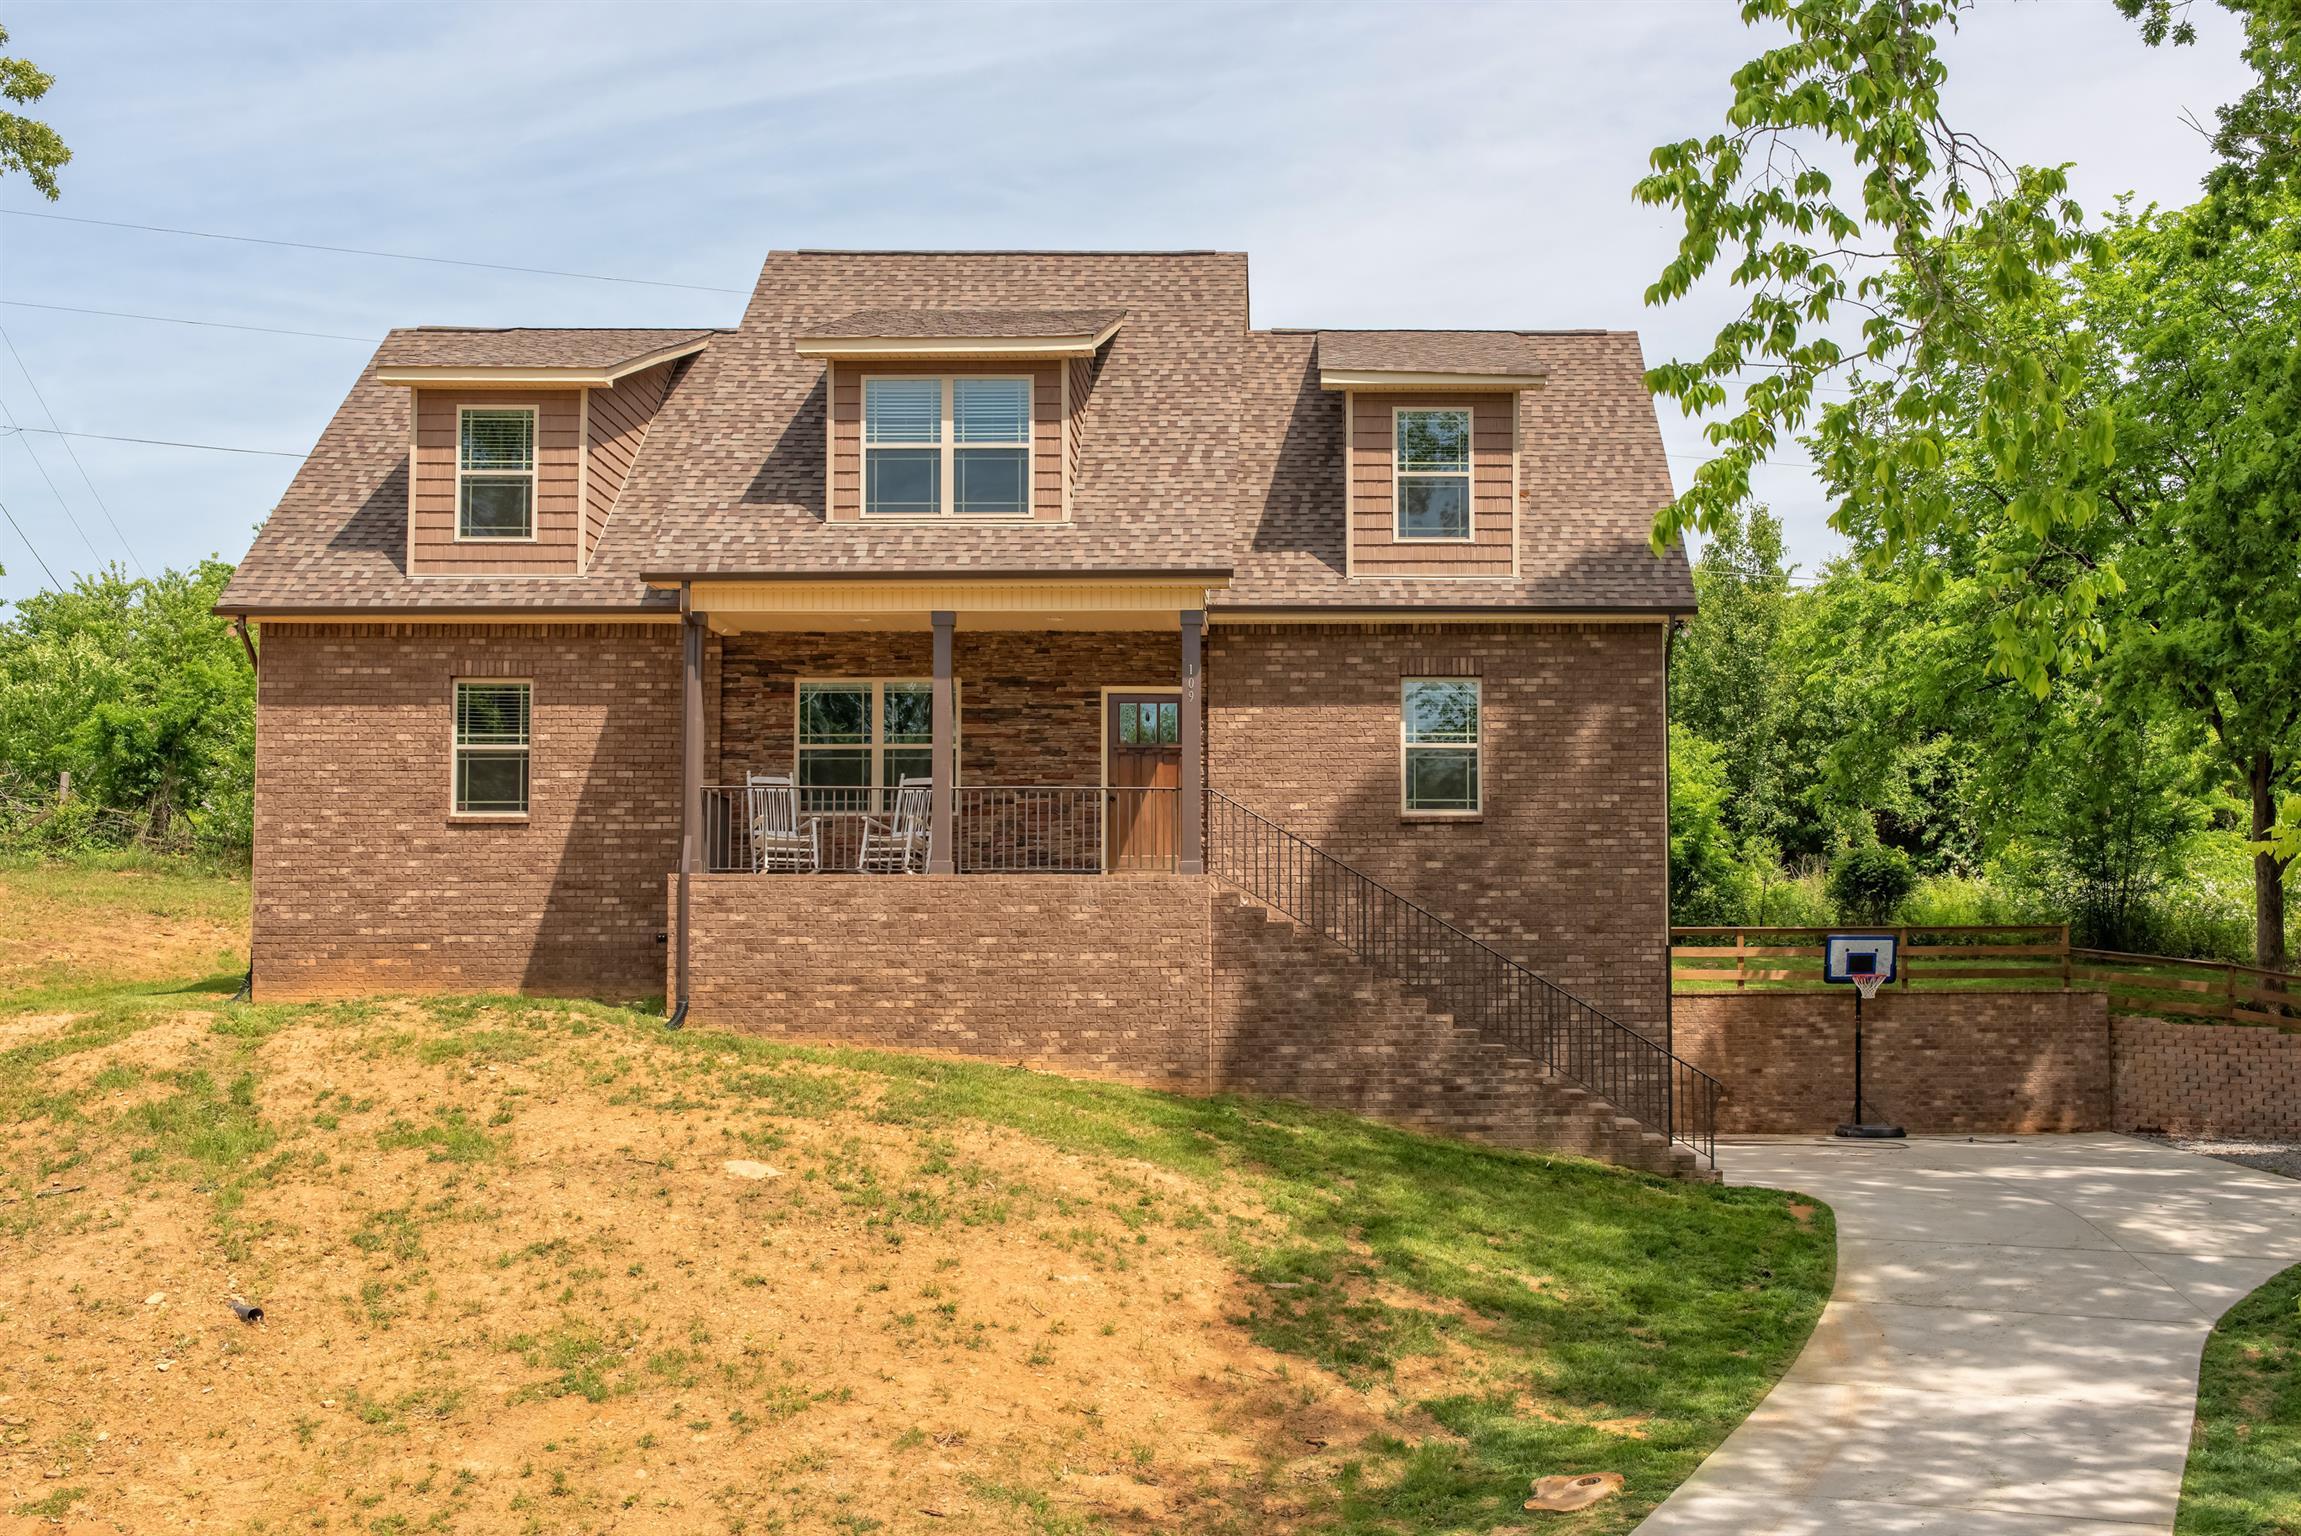 109 N Carson Ct, White House, TN 37188 - White House, TN real estate listing